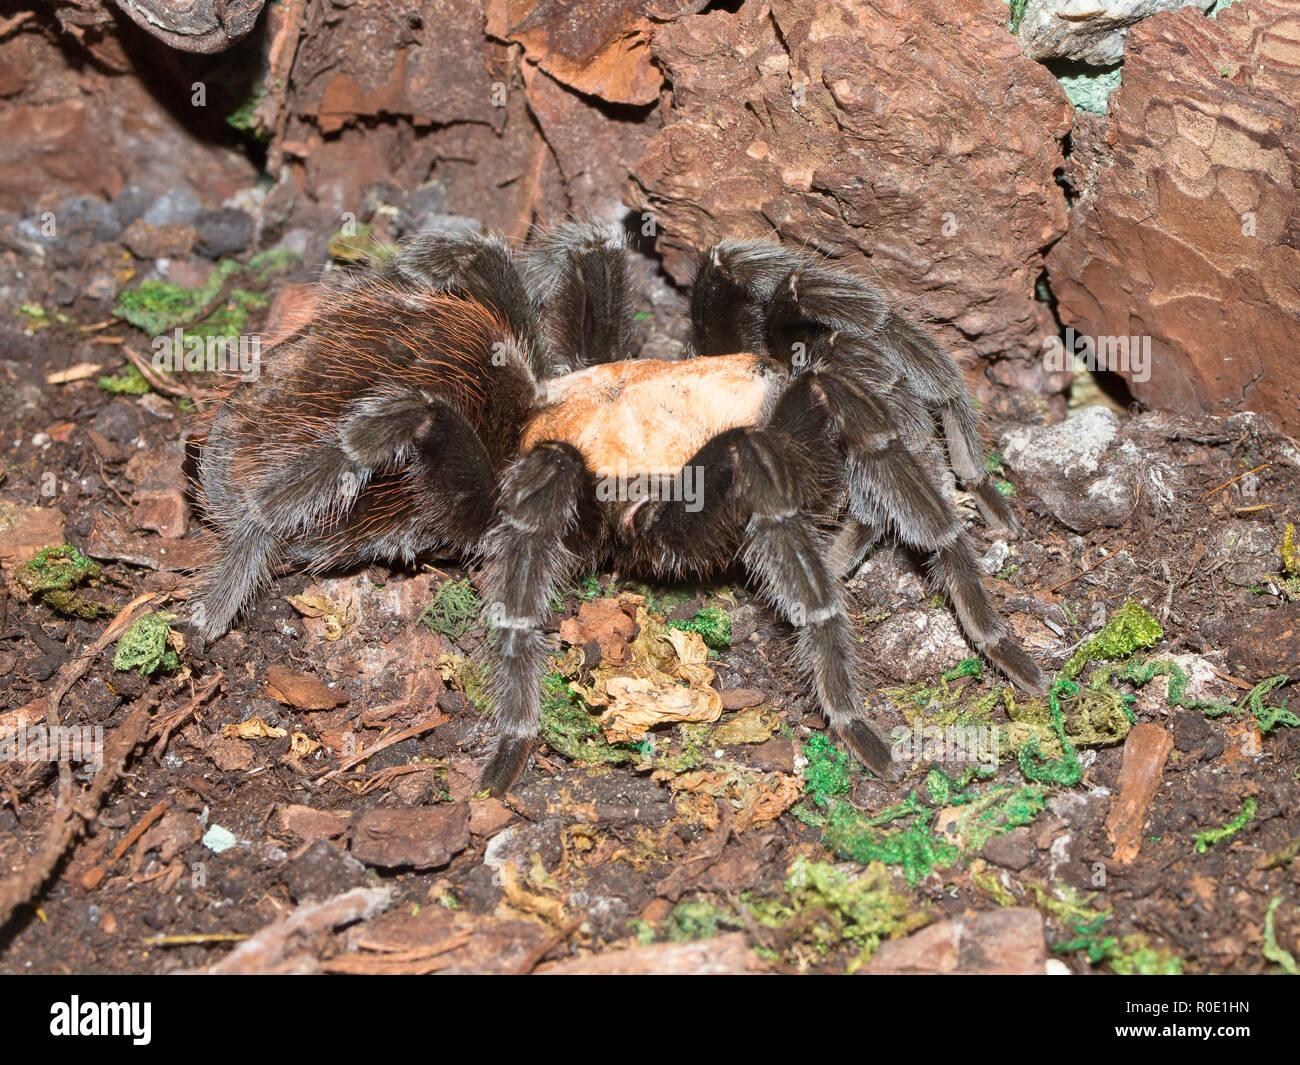 Tarantula Spider Brachypelma Albiceps In A Terrarium Stock Photo Alamy